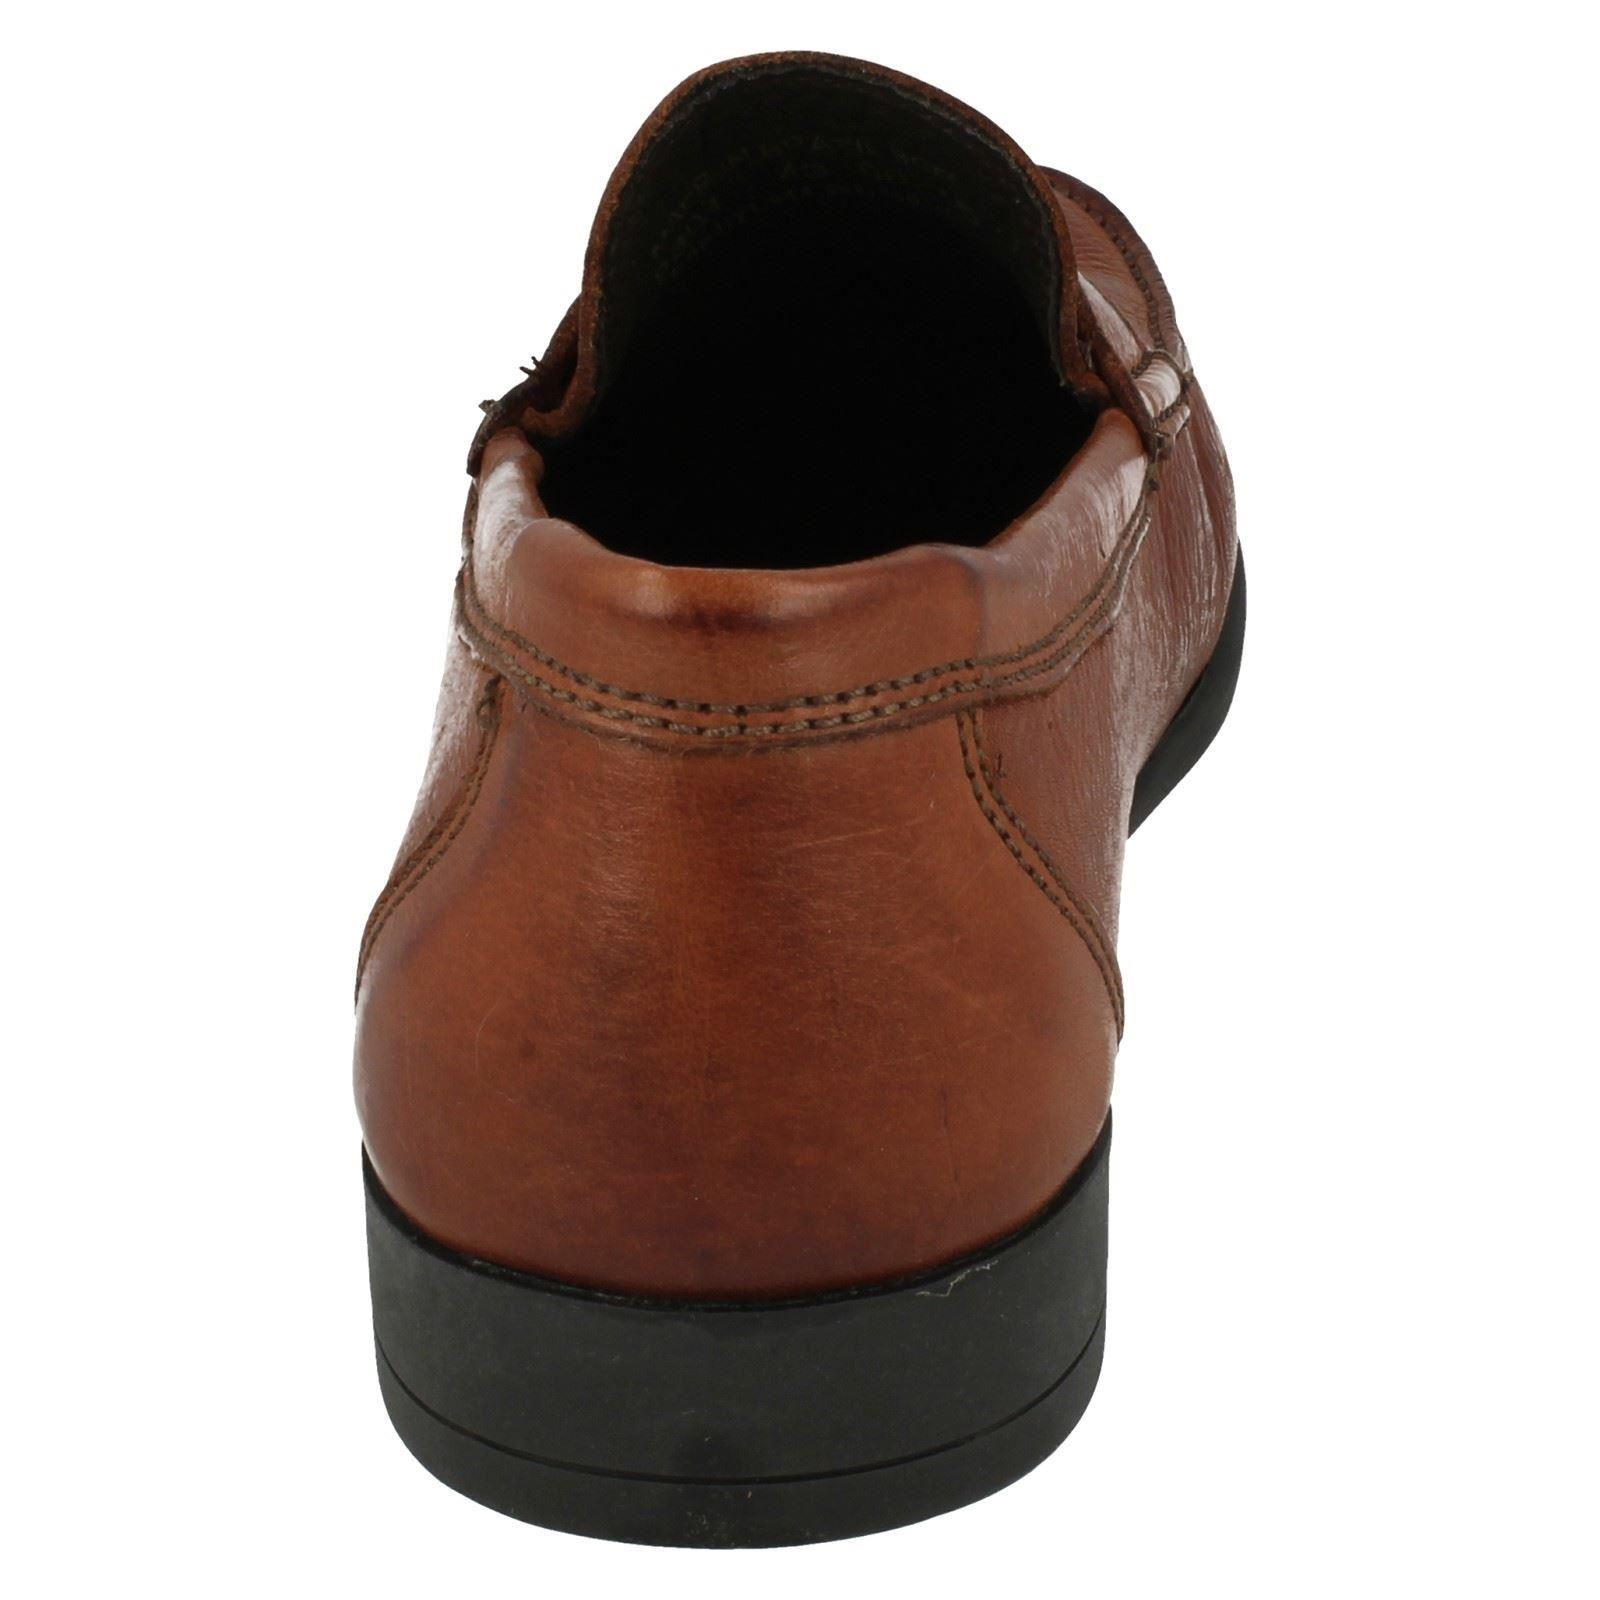 Mens Anatomic Smart Loafers /'Castelo/'